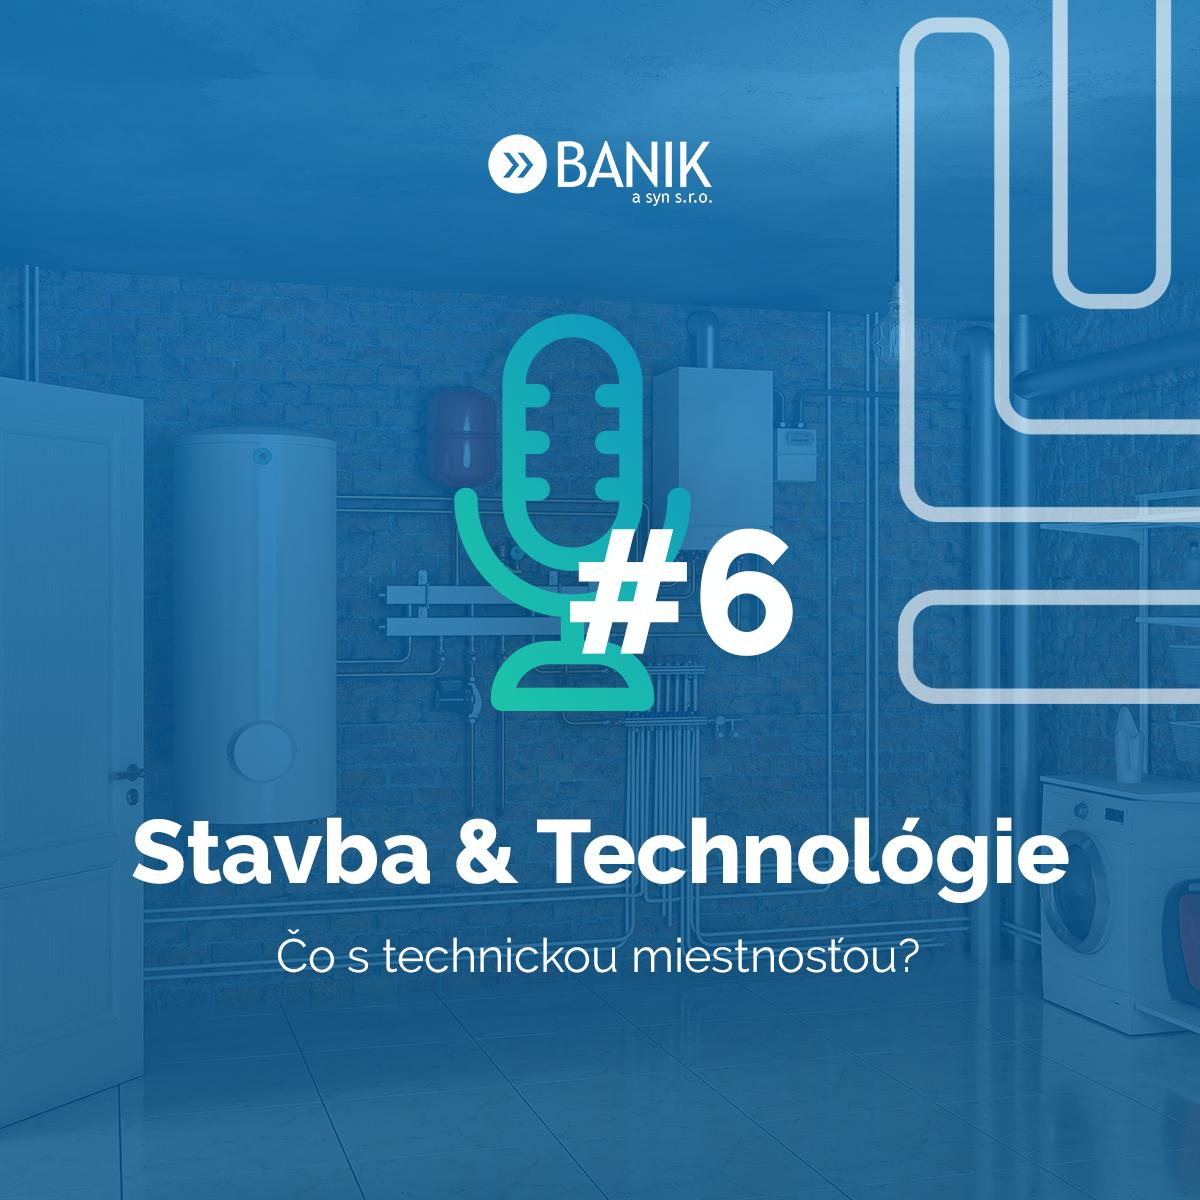 Stavba & Technológie